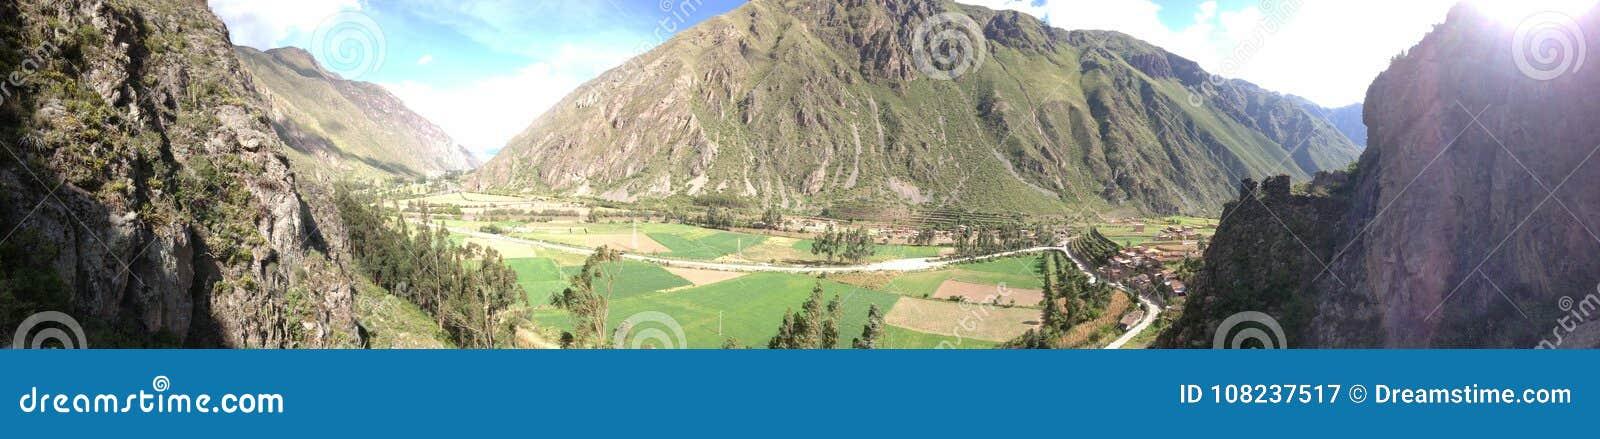 Valle sacra di panorama del Perù